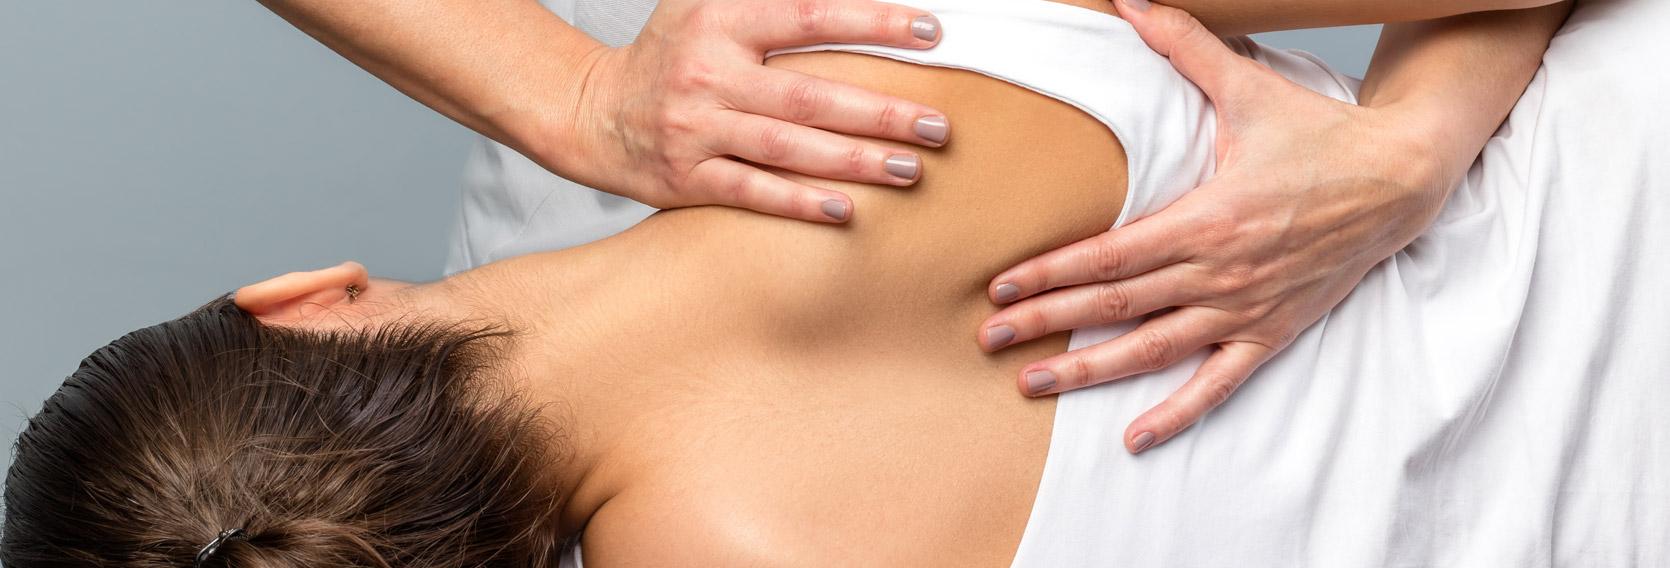 Was ist Osteopathie | Praxis Kerstin Finke